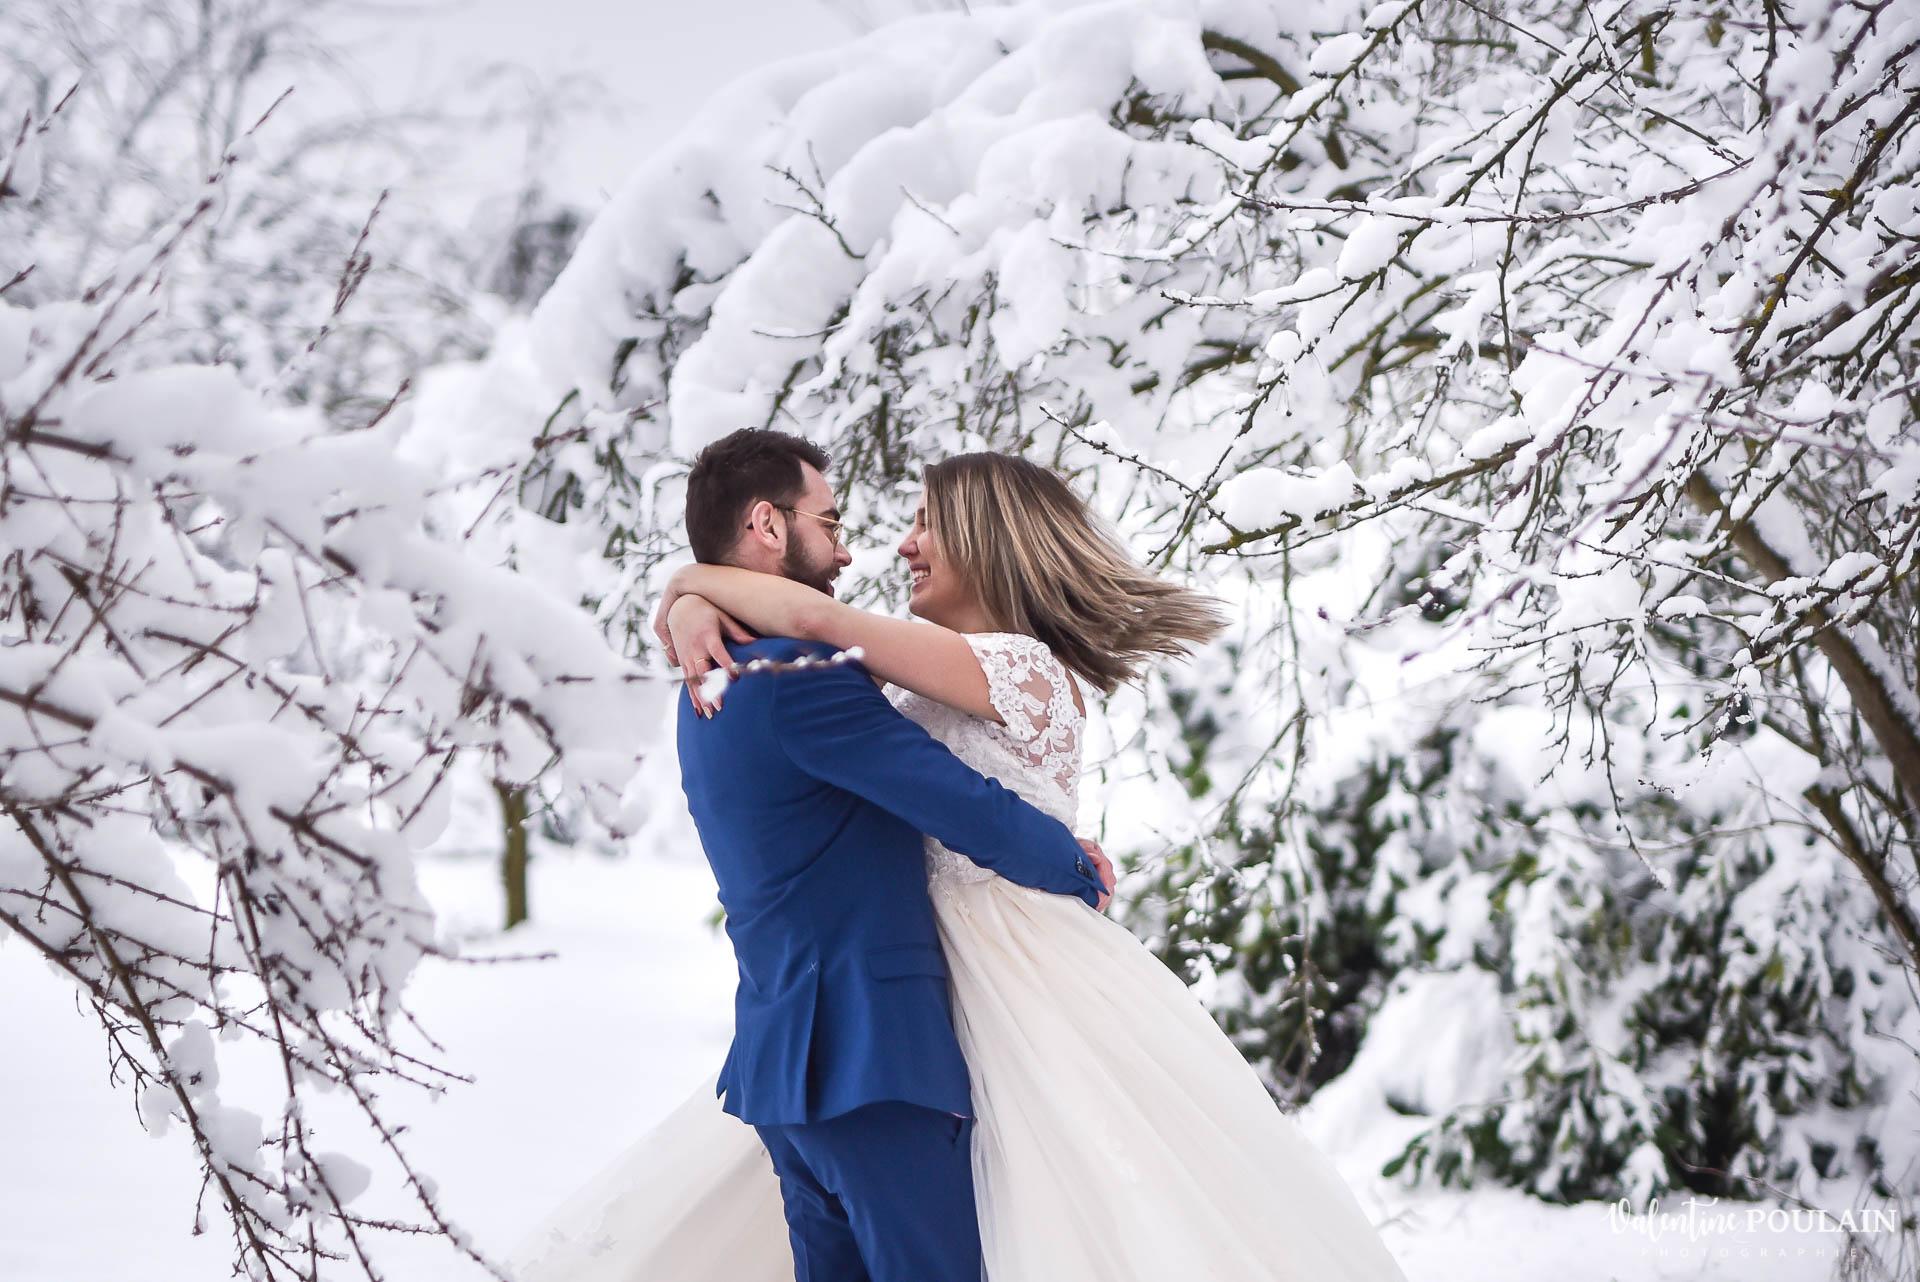 Photo mariage neige hiver - Valentine Poulain tourner